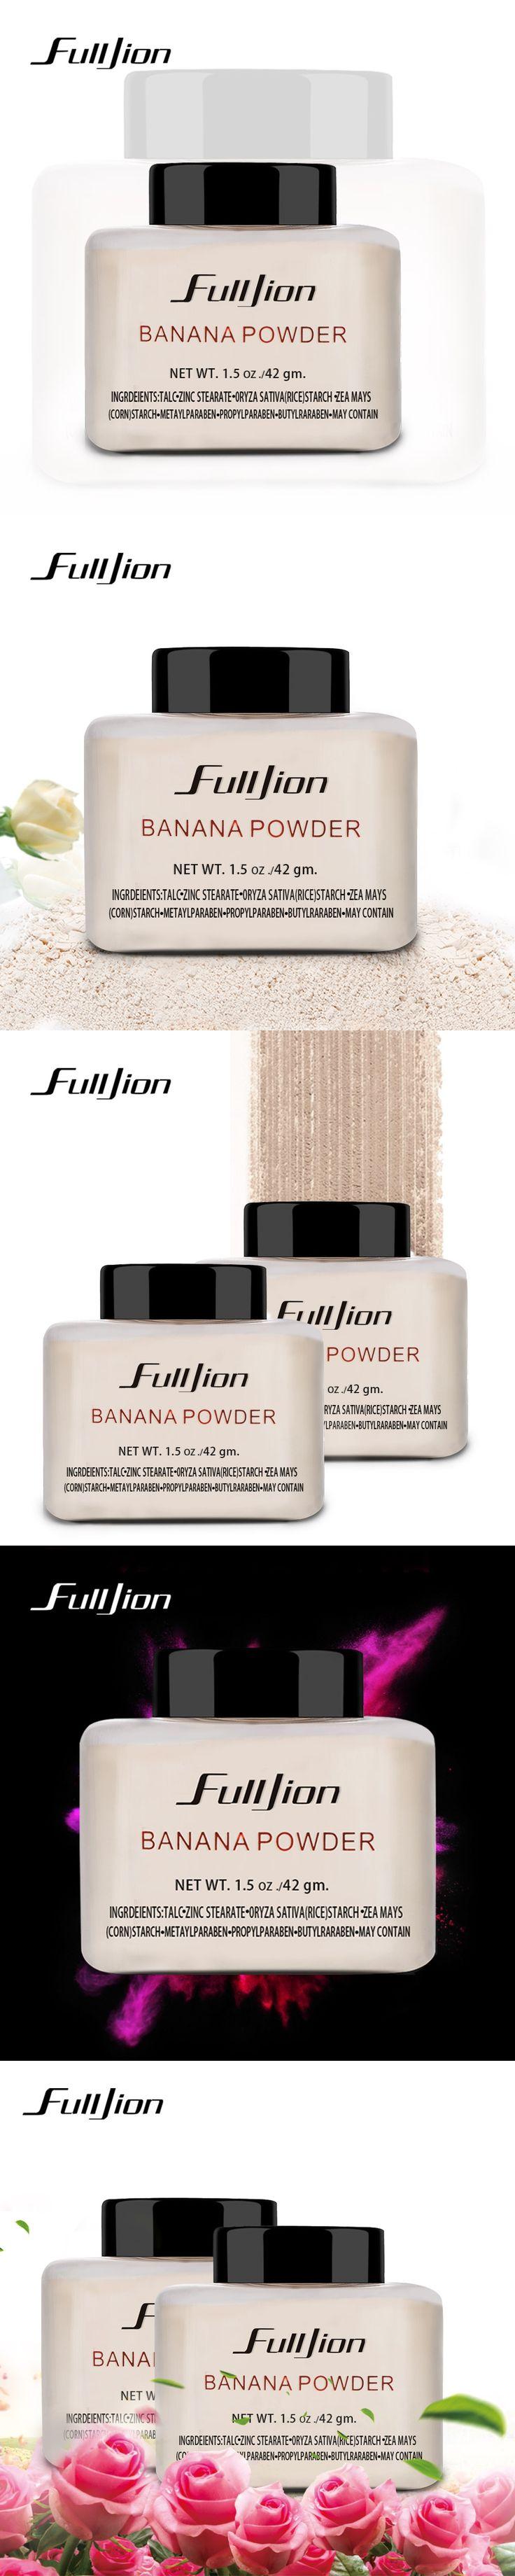 Fulljion 1pc Women Makeup Loose Banana Powder 1.5 oz Bottle Authentic Luxury For Face Foundation Beauty Makeup highlighter